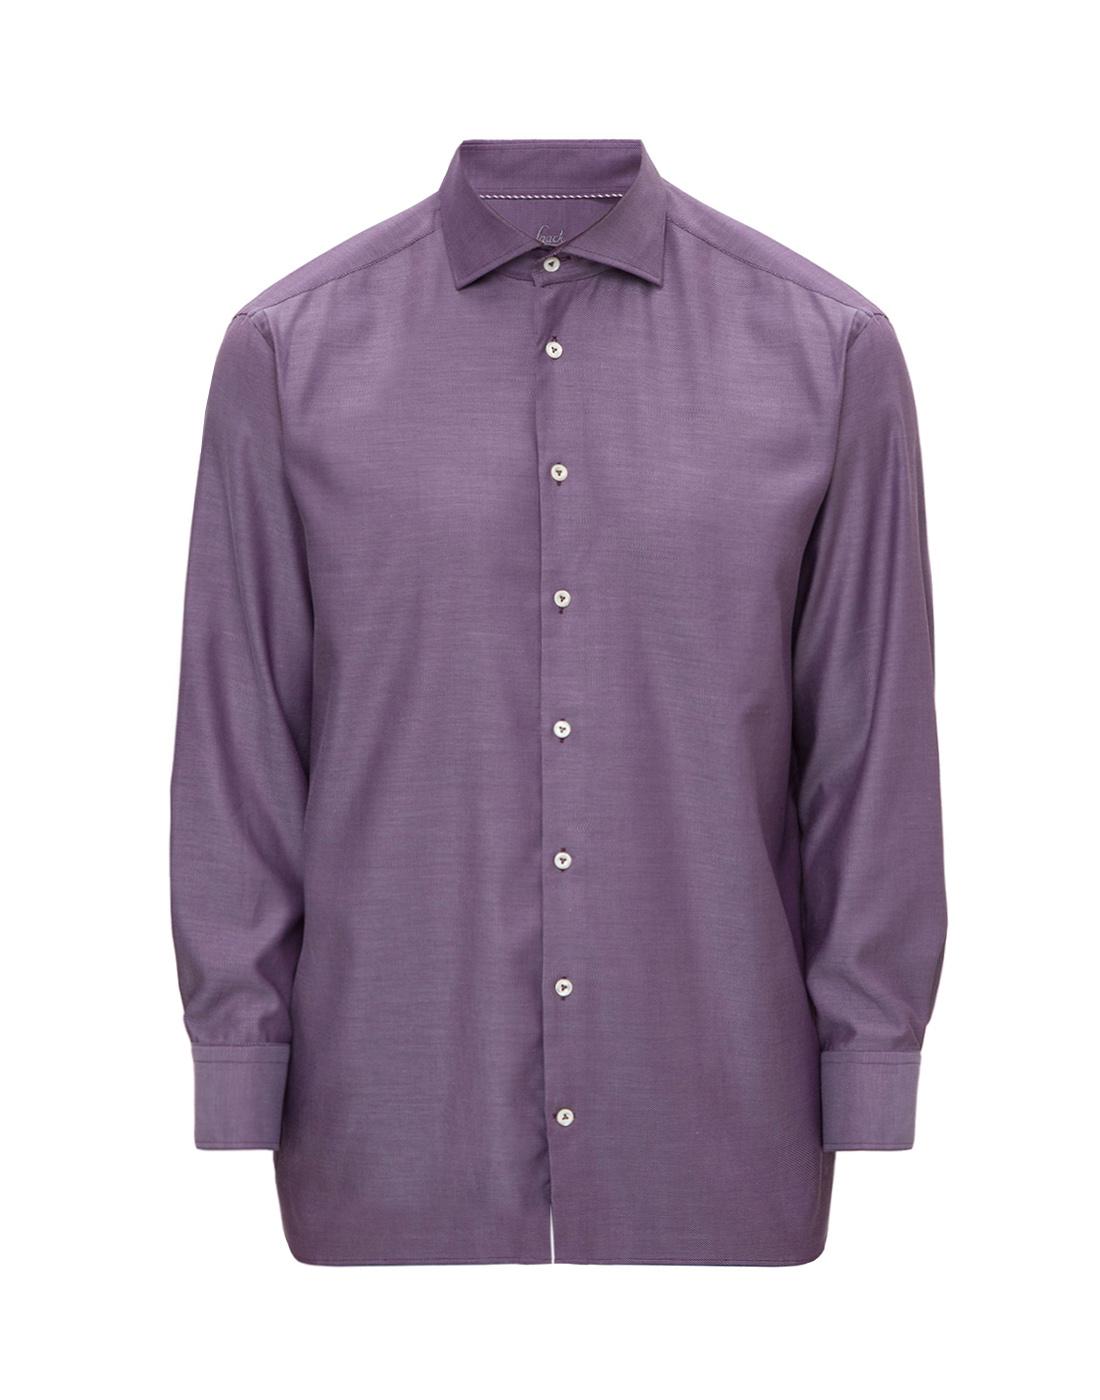 Мужская сиреневая рубашка Van Laack S151377/670-1